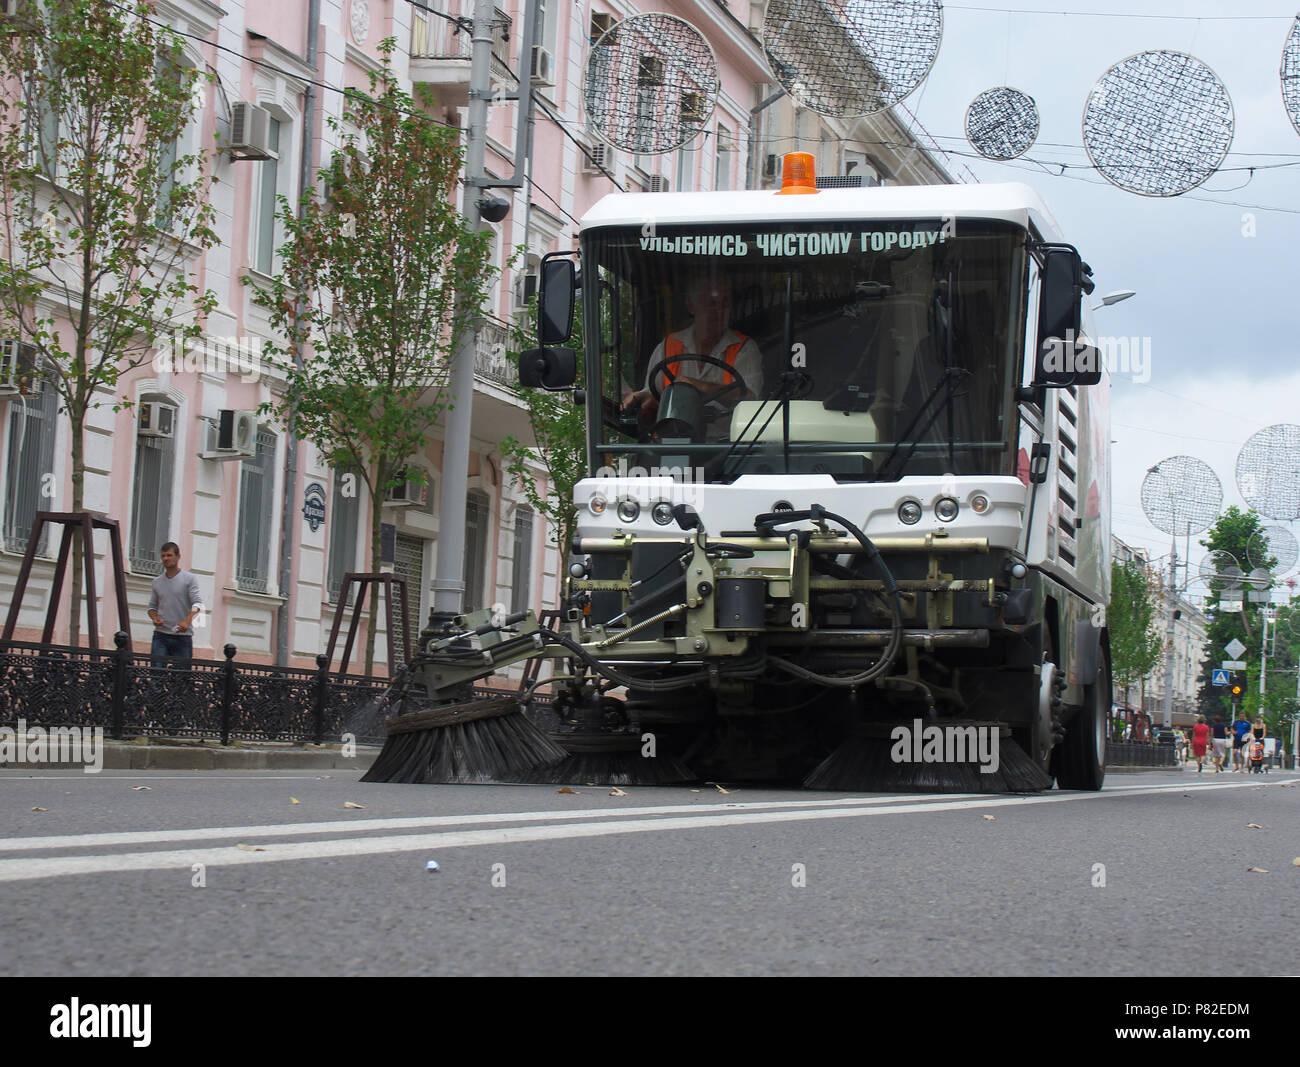 Krasnodar Russia July 06 2014 Sweeper On The Streets Of Krasnodar Stock Photo Alamy